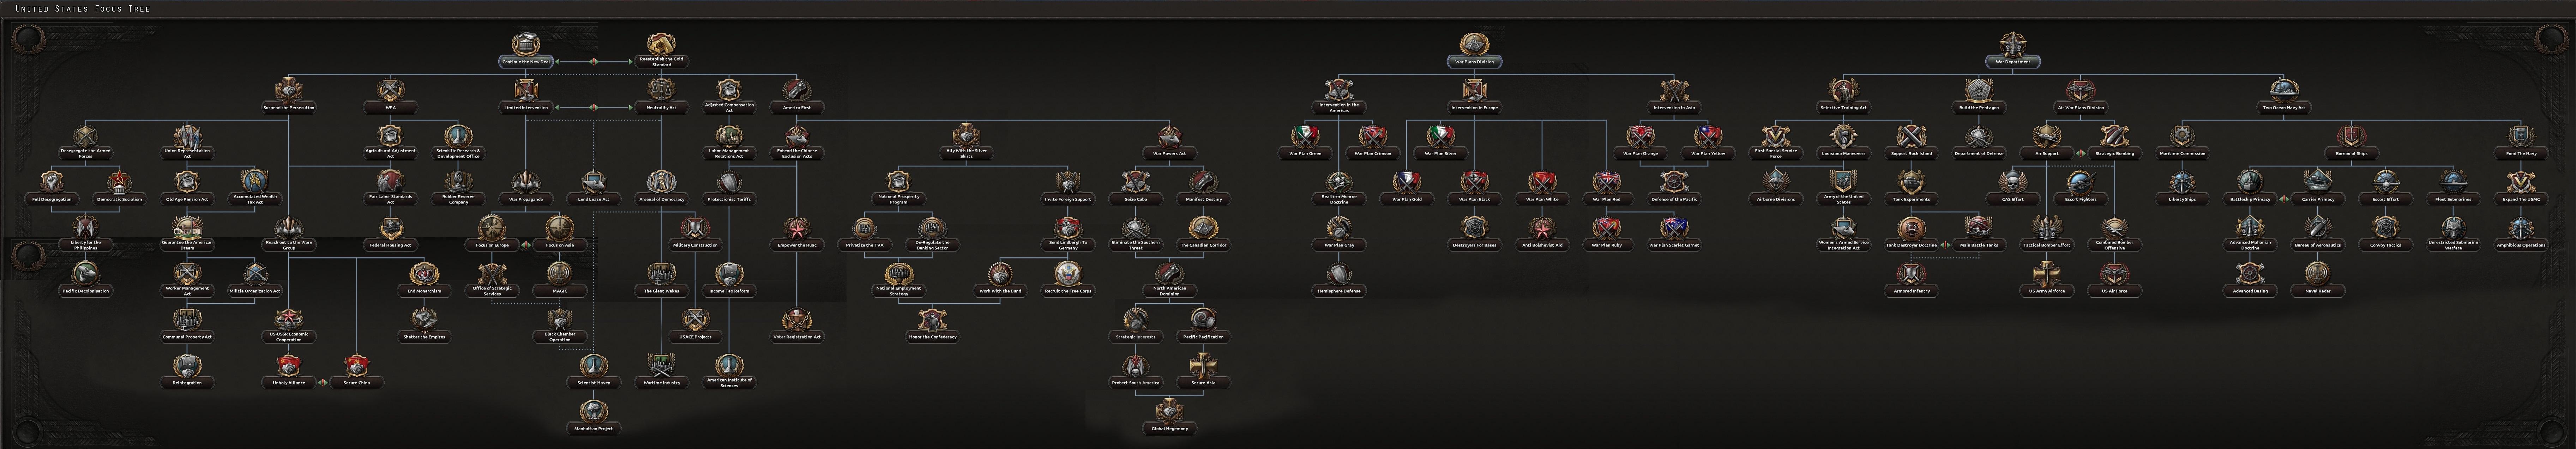 NF_tree_USA.jpg